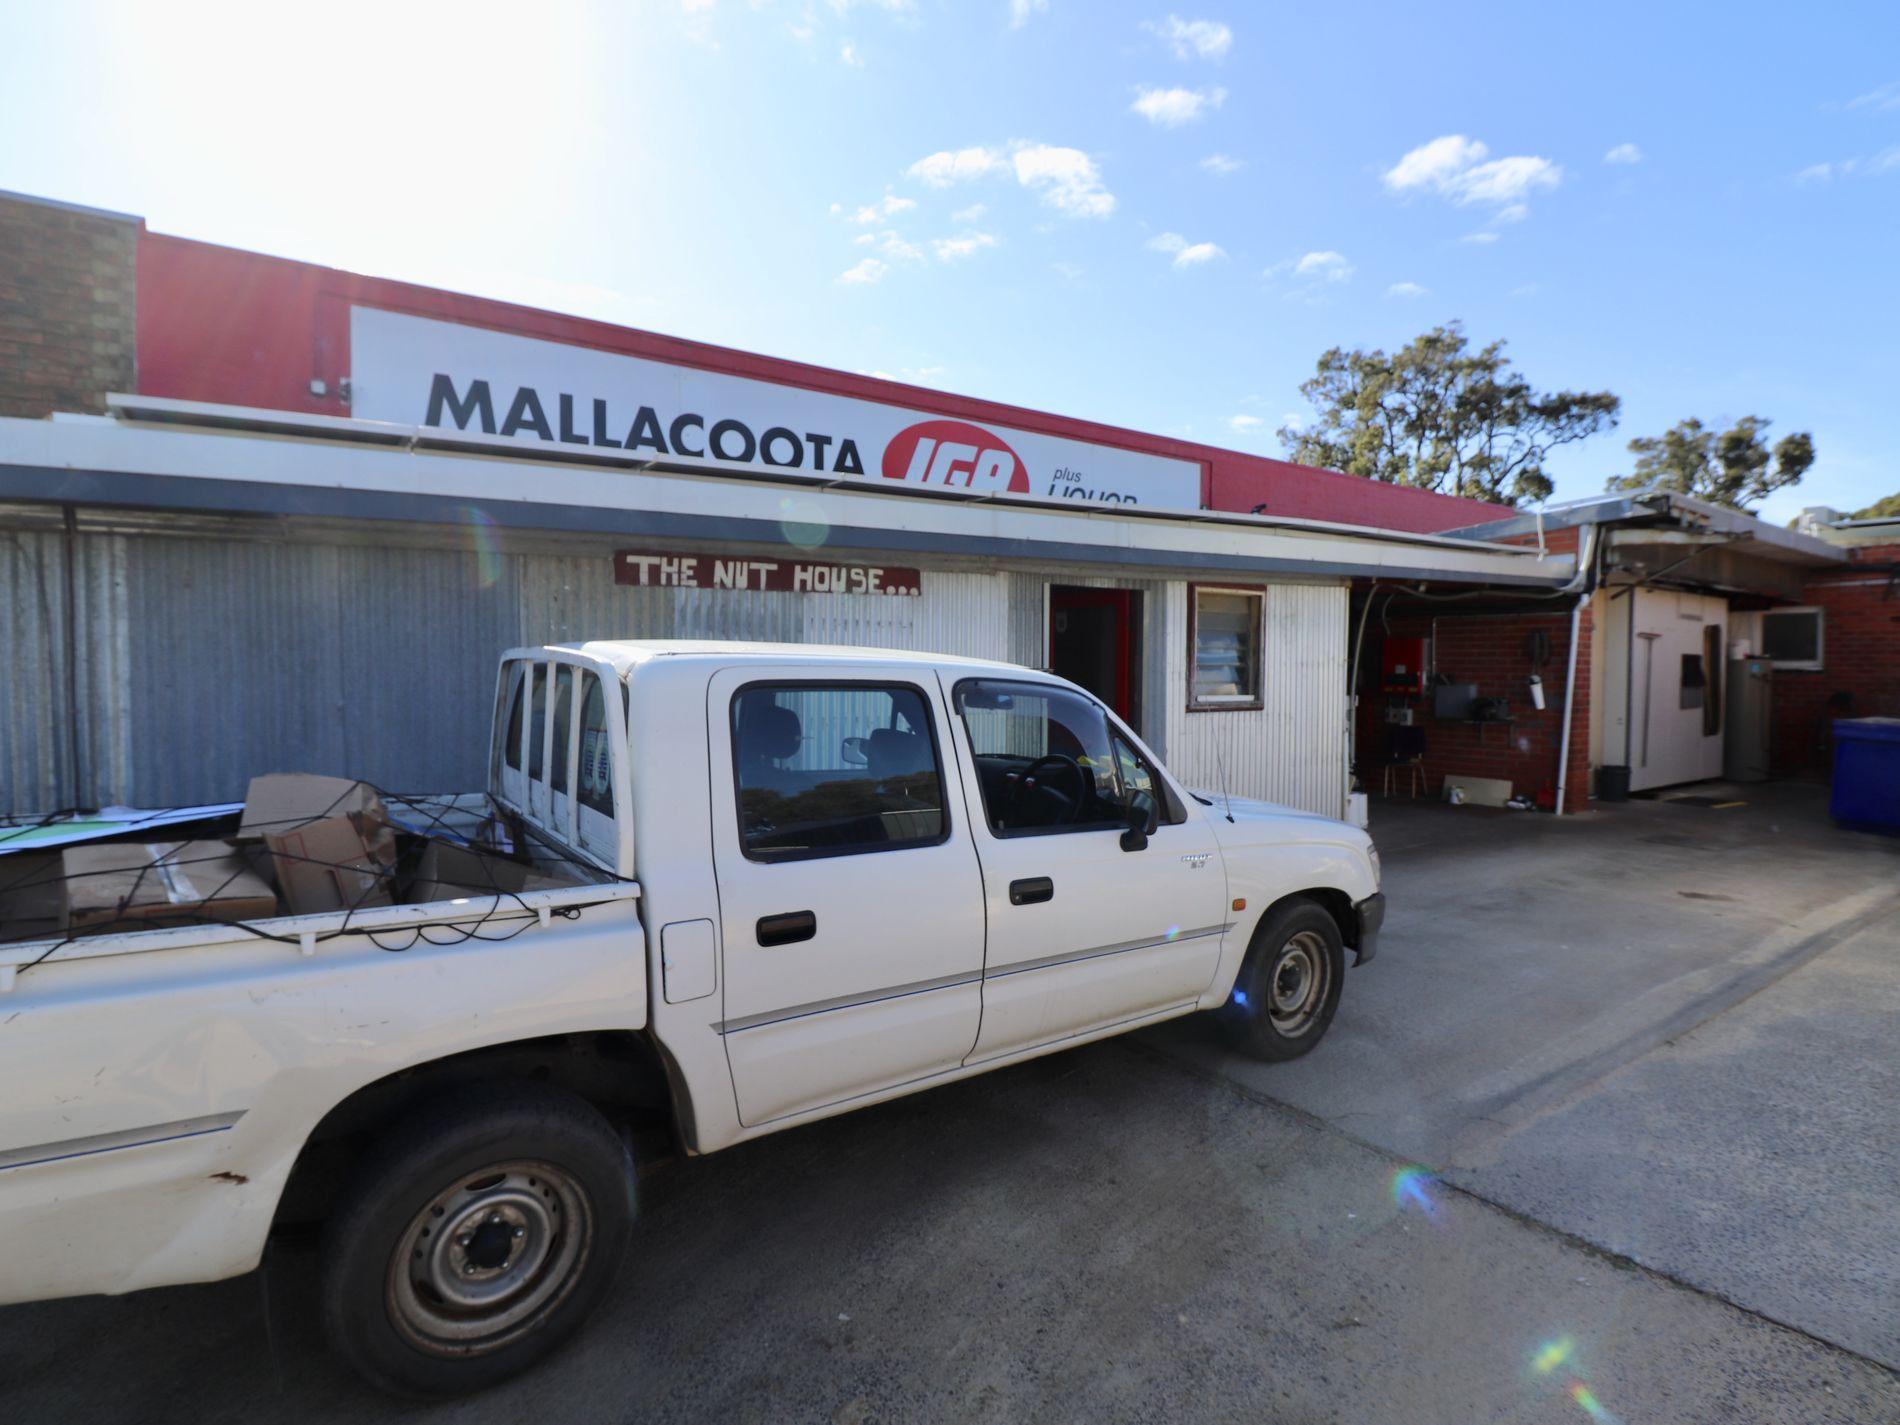 47 Maurice Avenue, Mallacoota